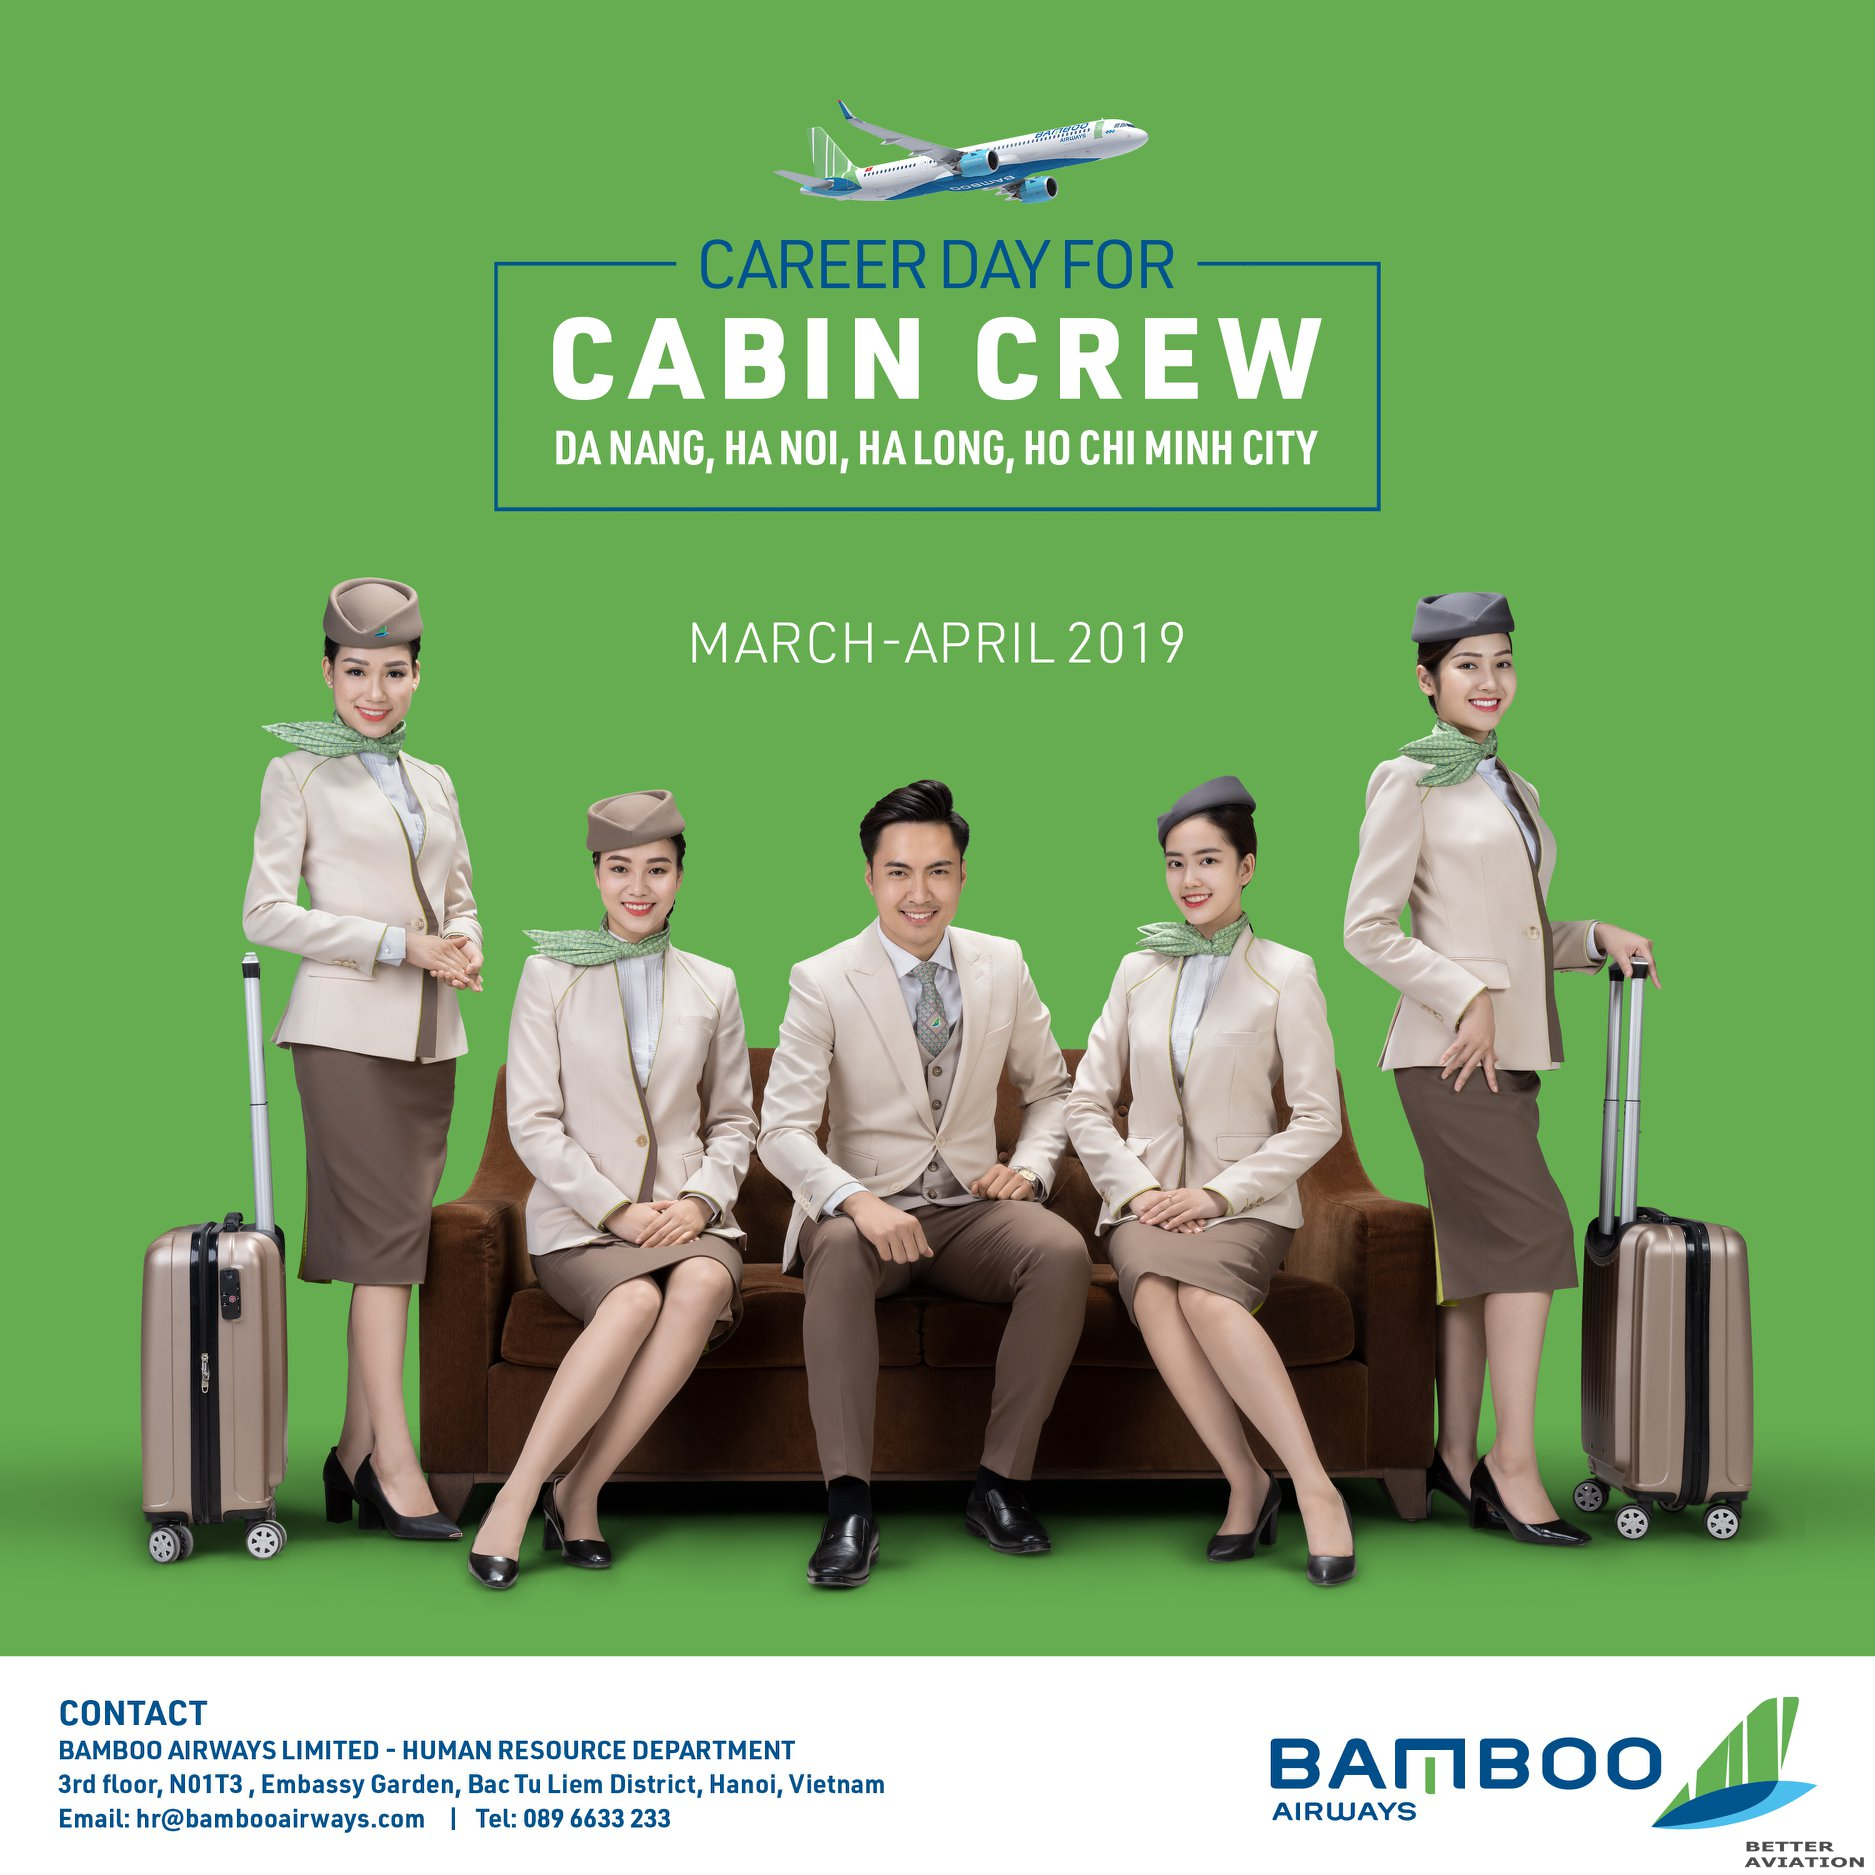 Bamboo Airways Cabin Crew Recruitments [Vietnam] (March